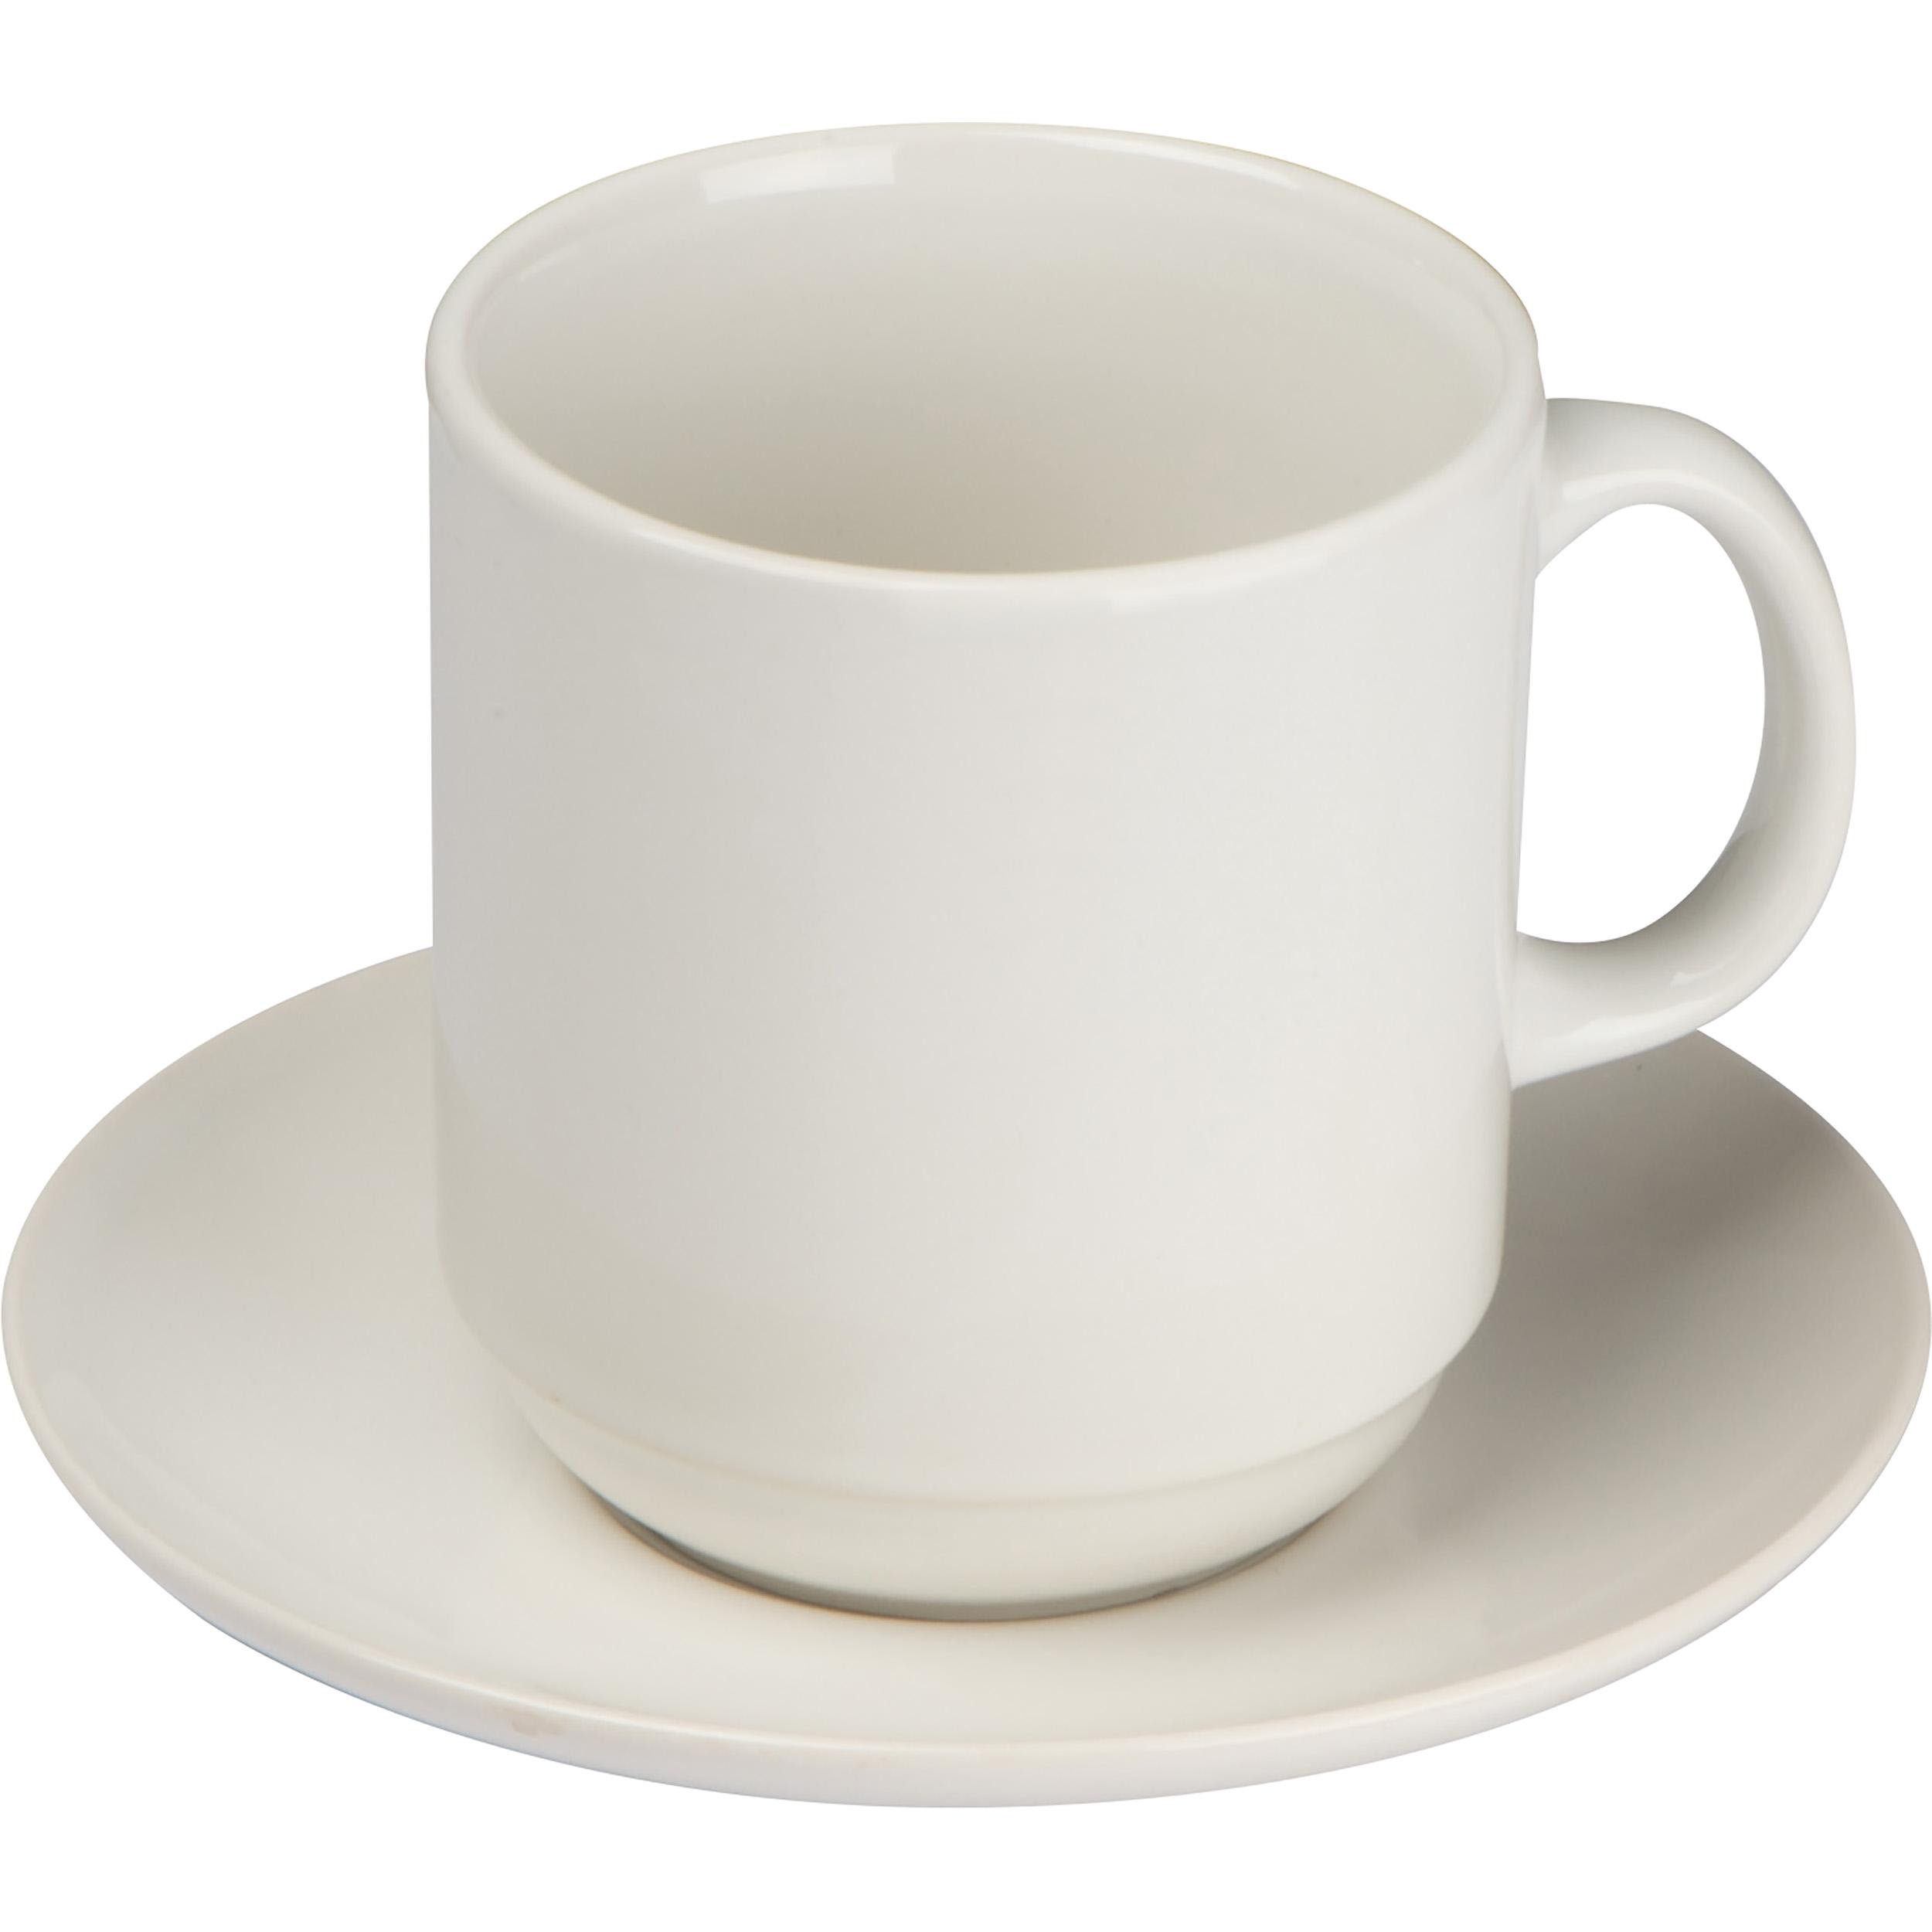 Set of white coffee mug and coaster